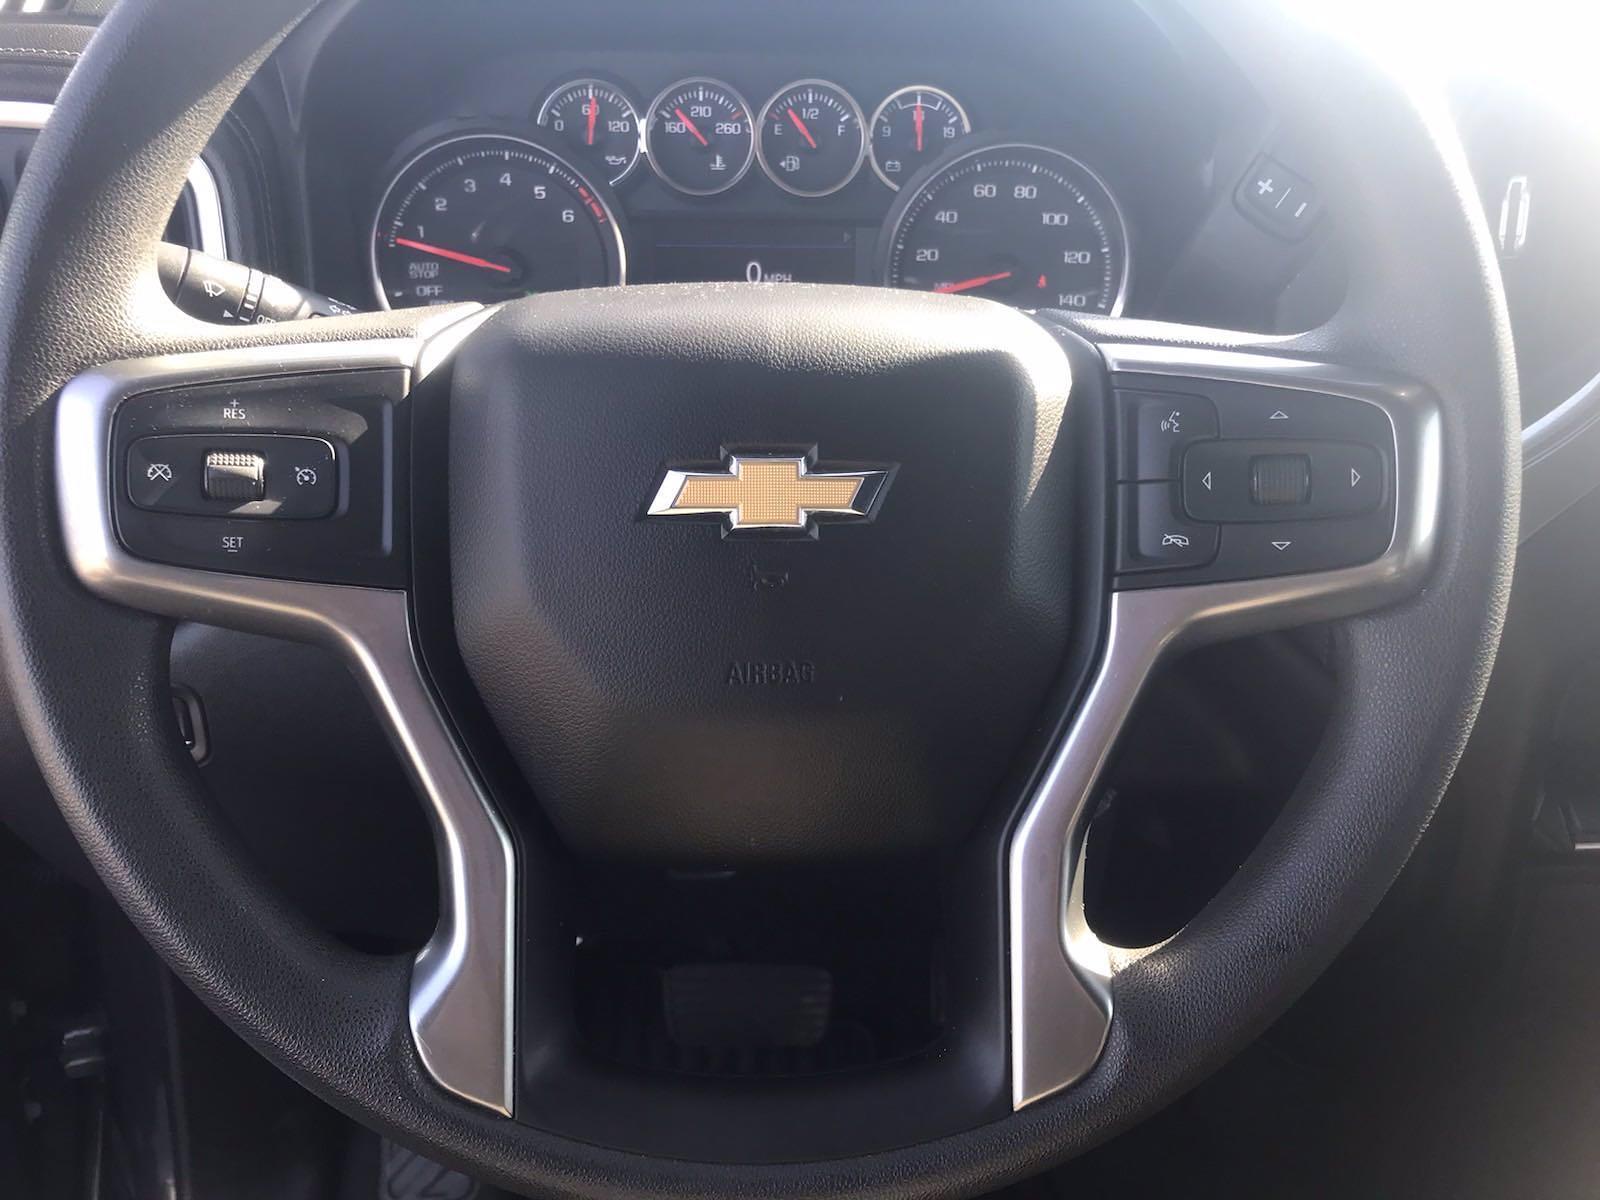 2020 Chevrolet Silverado 1500 Crew Cab 4x4, Pickup #16465P - photo 22